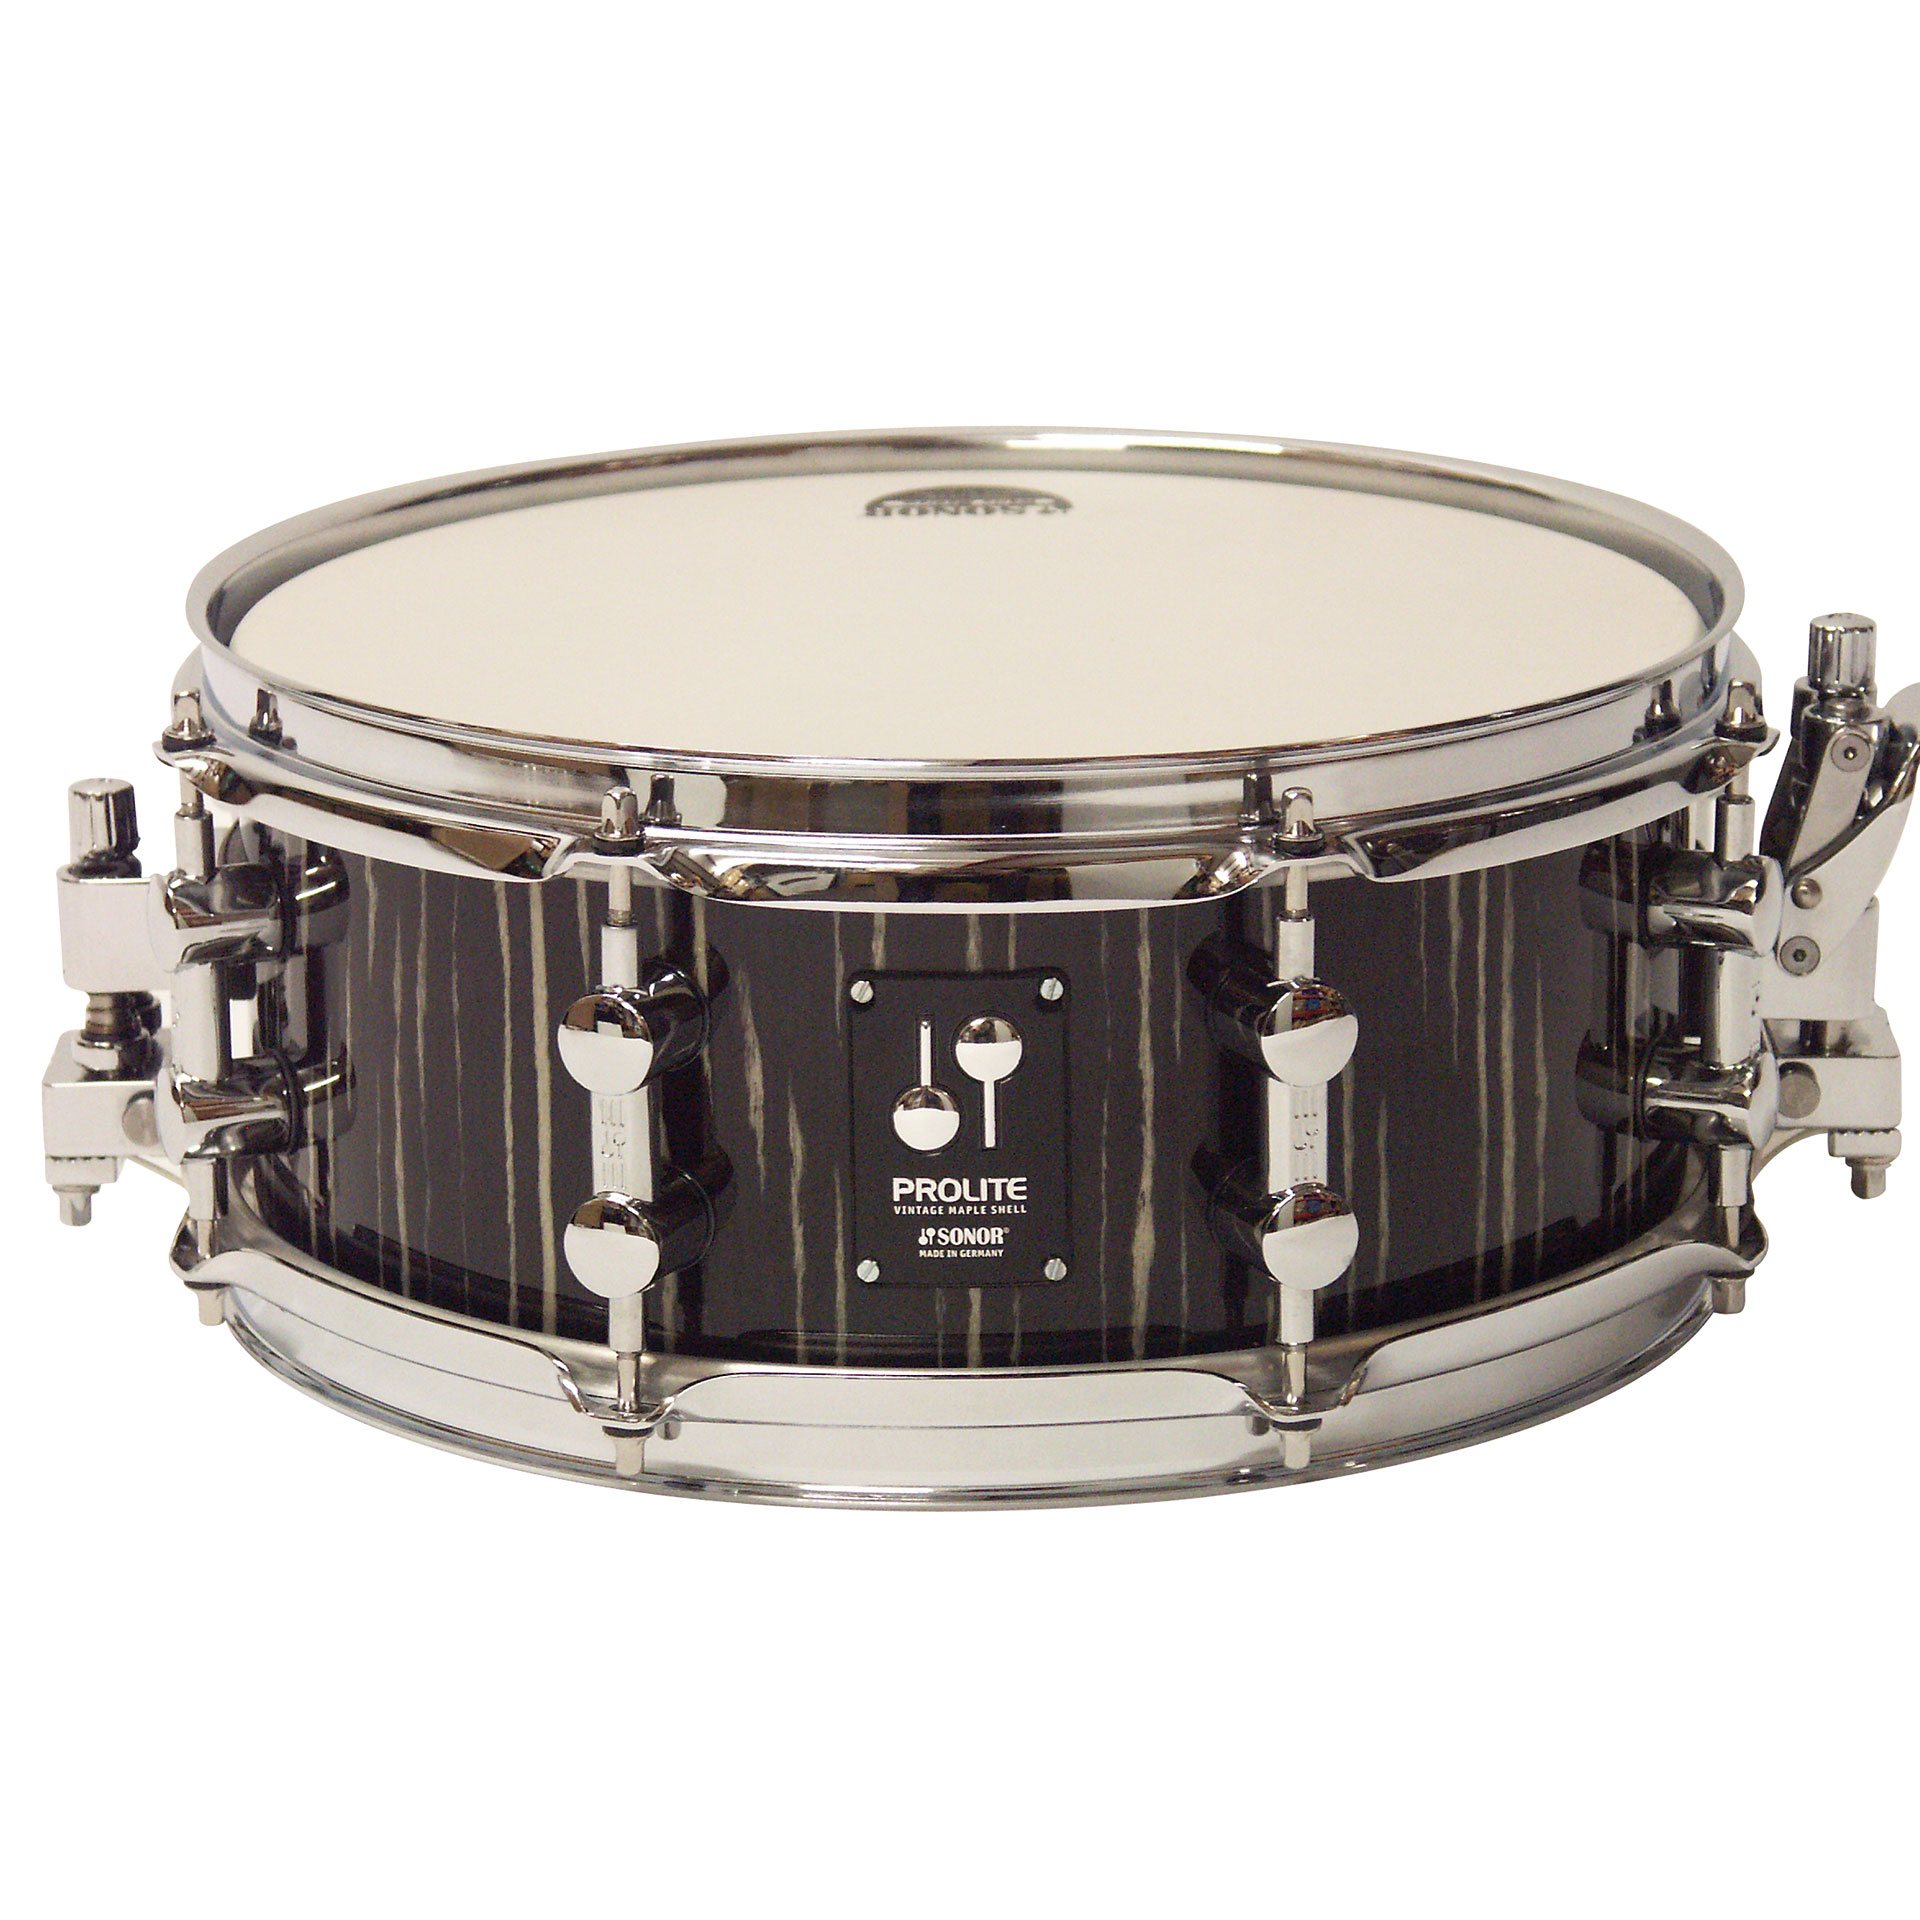 b28a240391ef Snare drum Sonor ProLite PL 1205 SDW Ebony White Stripes ...